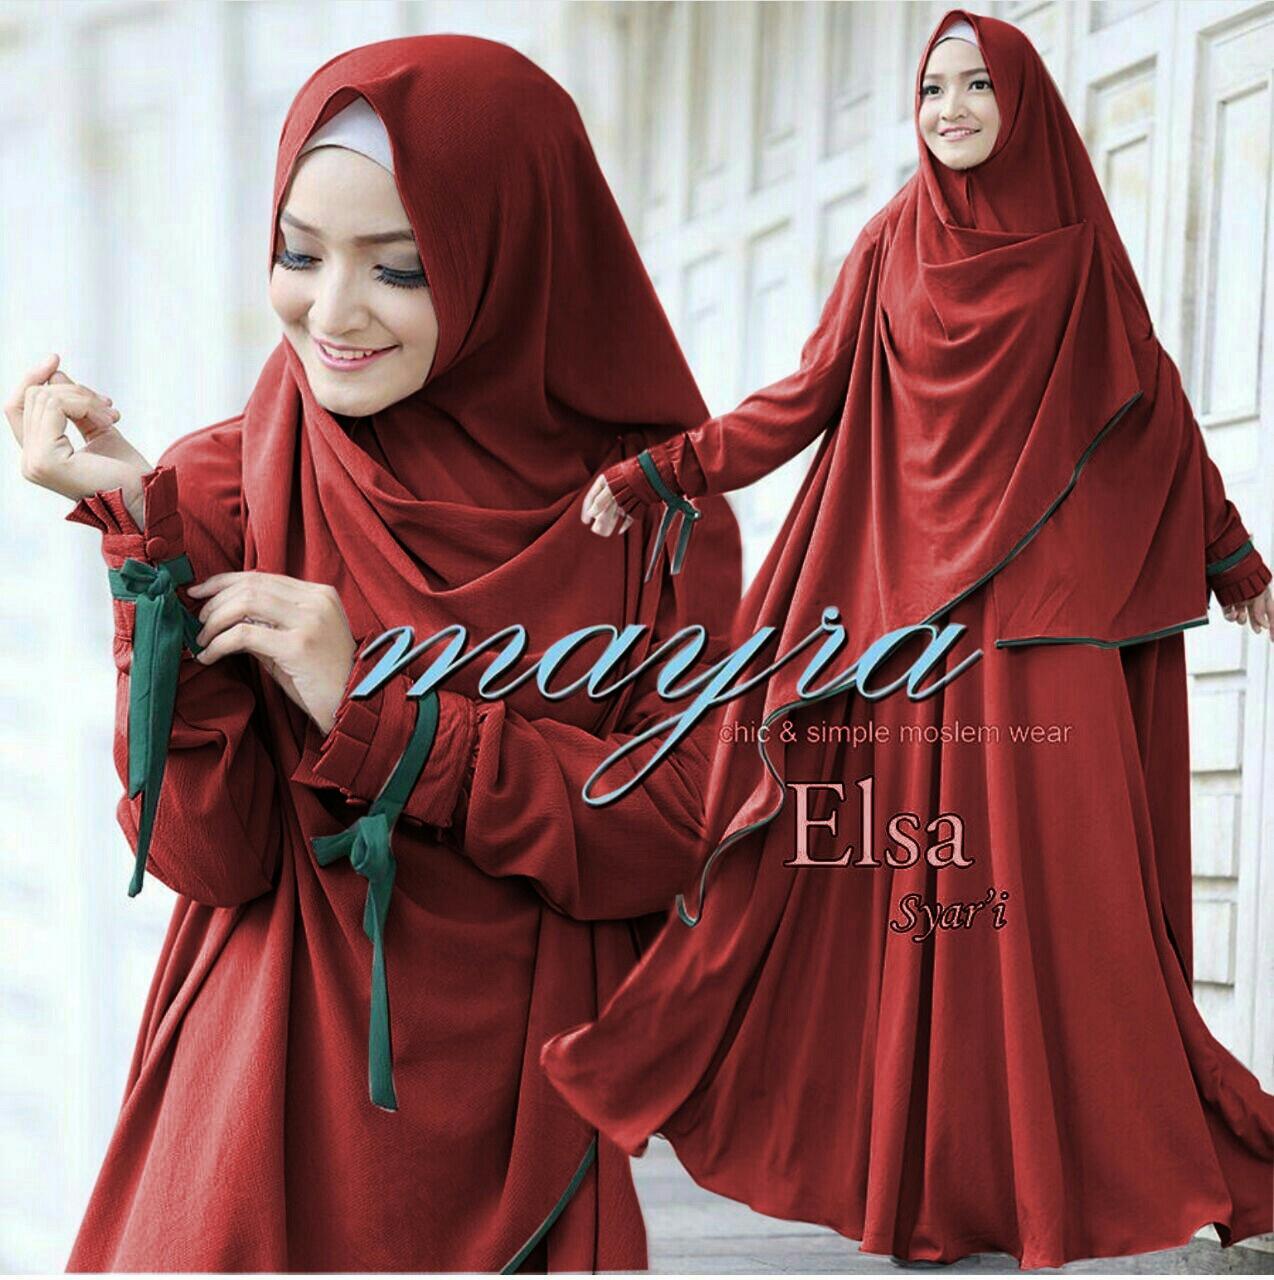 trendshopee Set Gamis Muslimah syari  Mayra Elsa